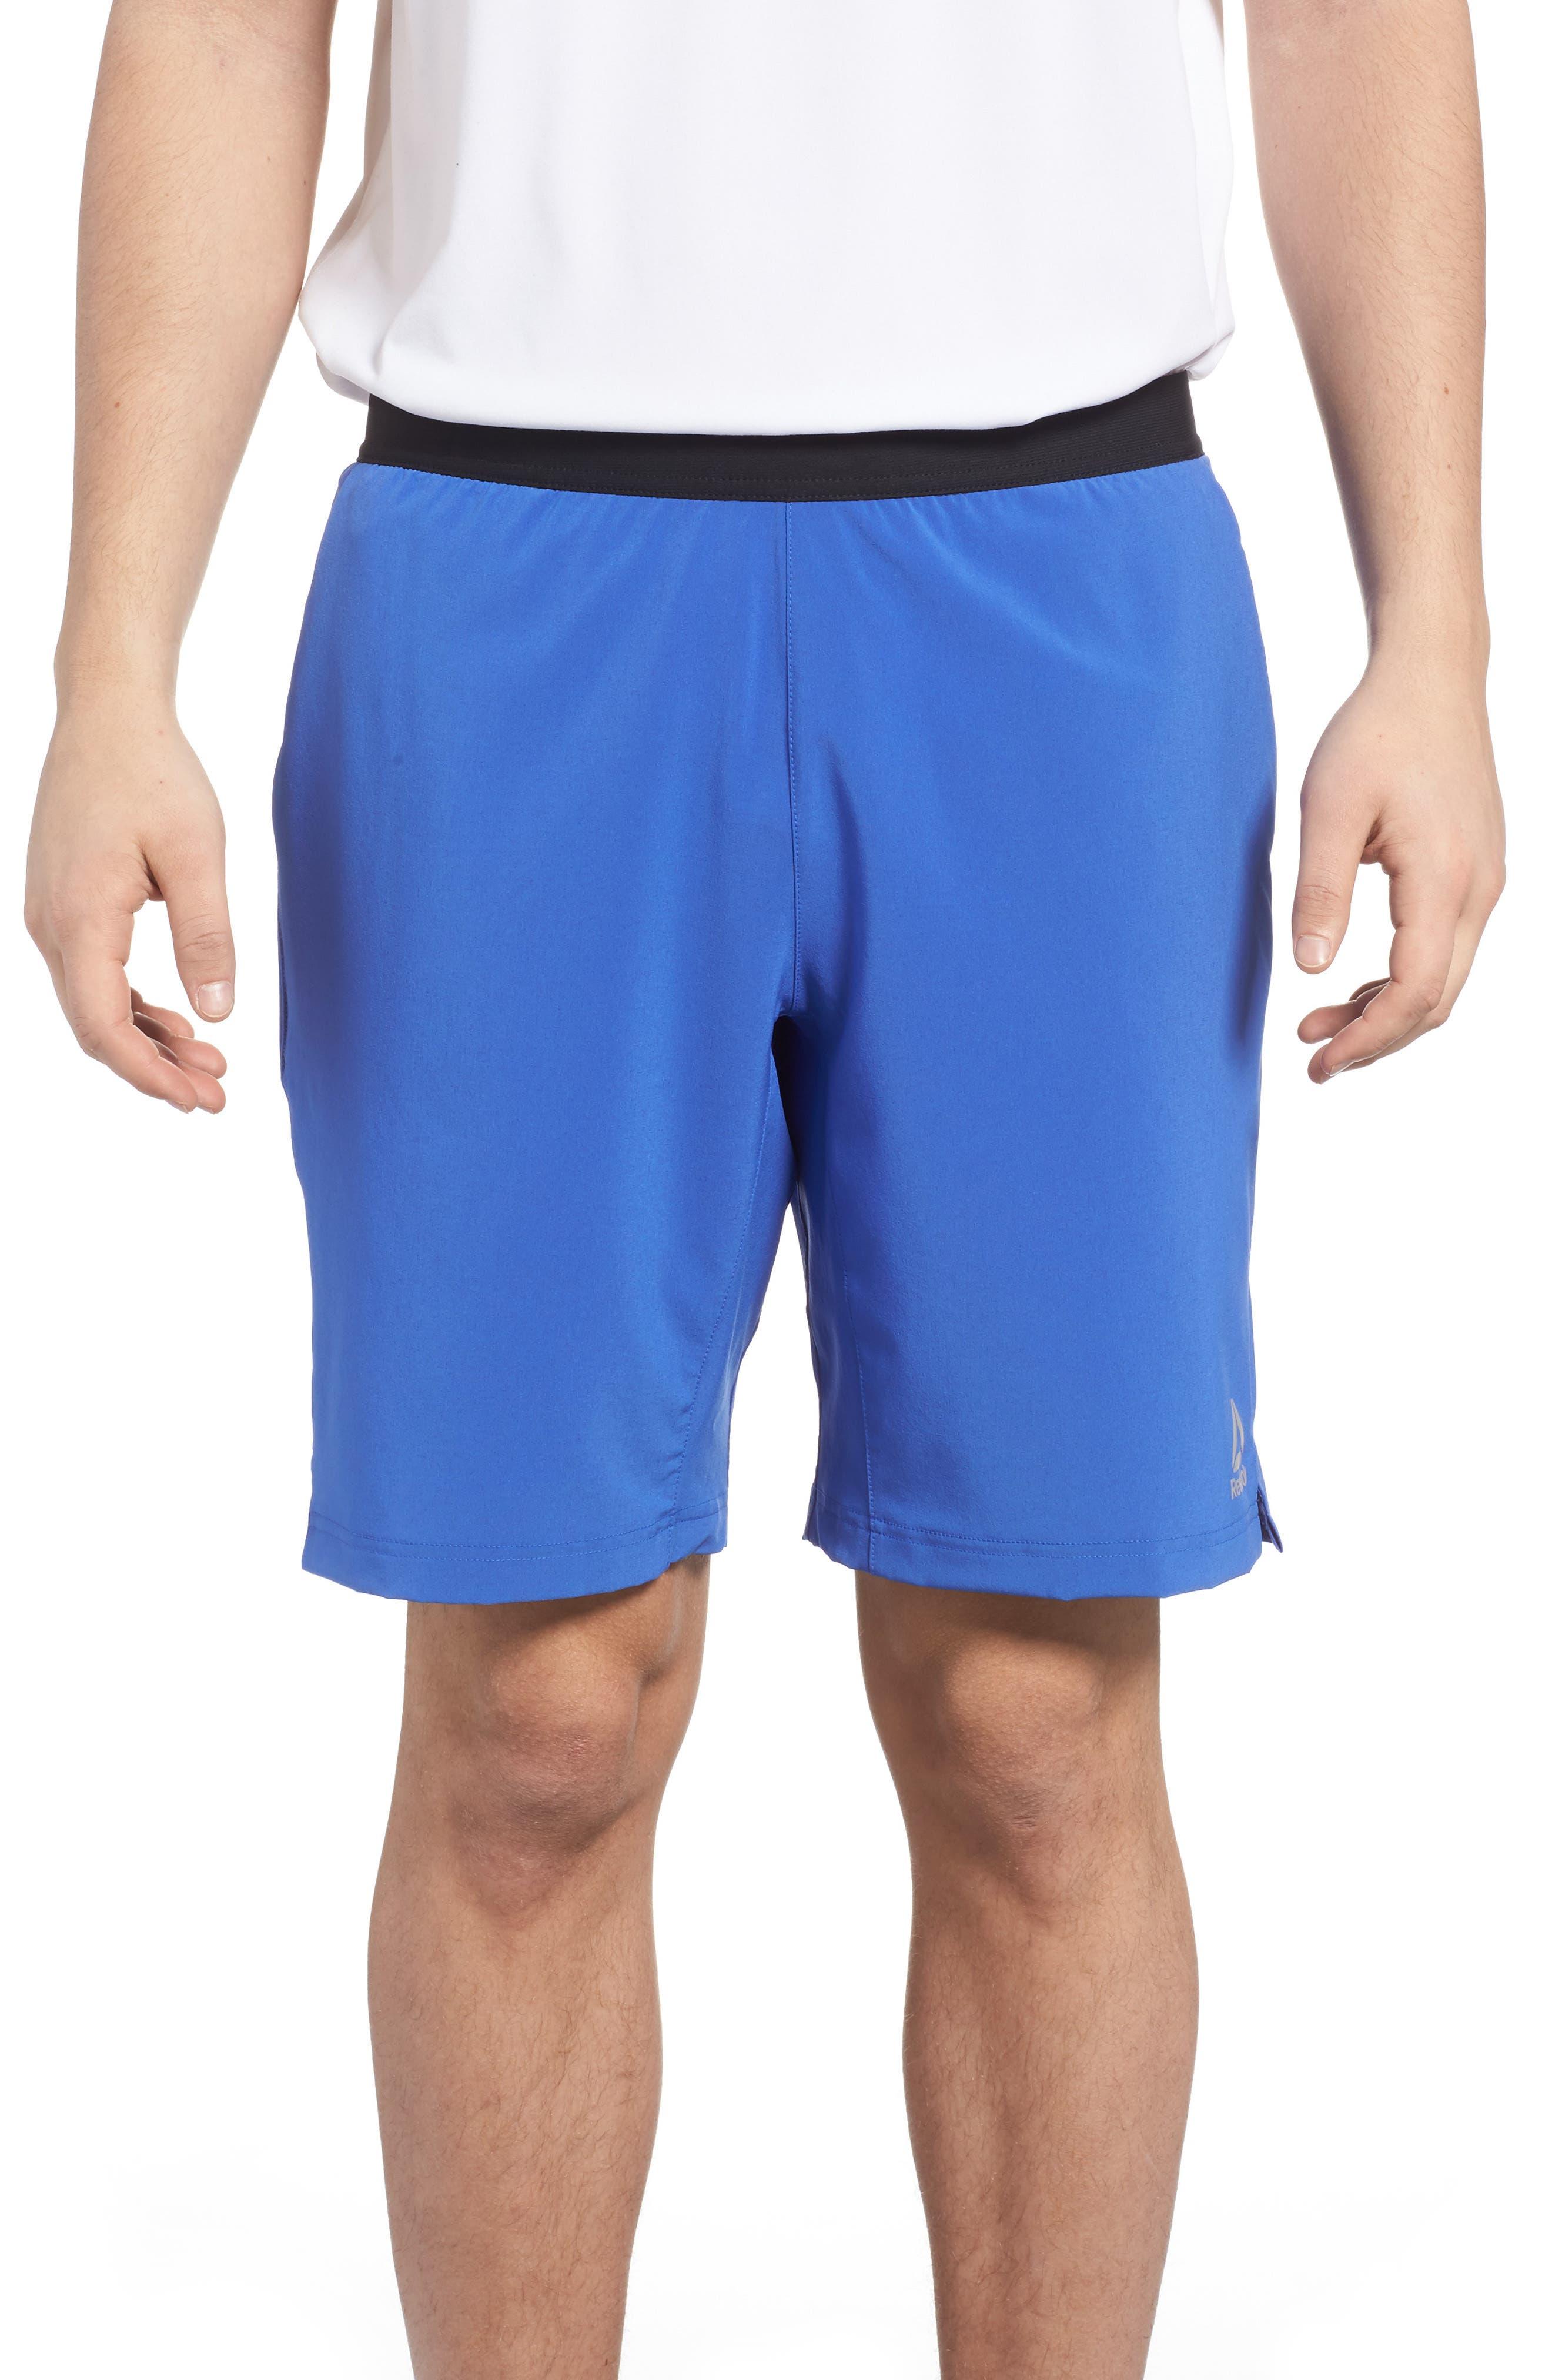 Speedwick Speed Training Shorts,                         Main,                         color, Acid Blue S18-R